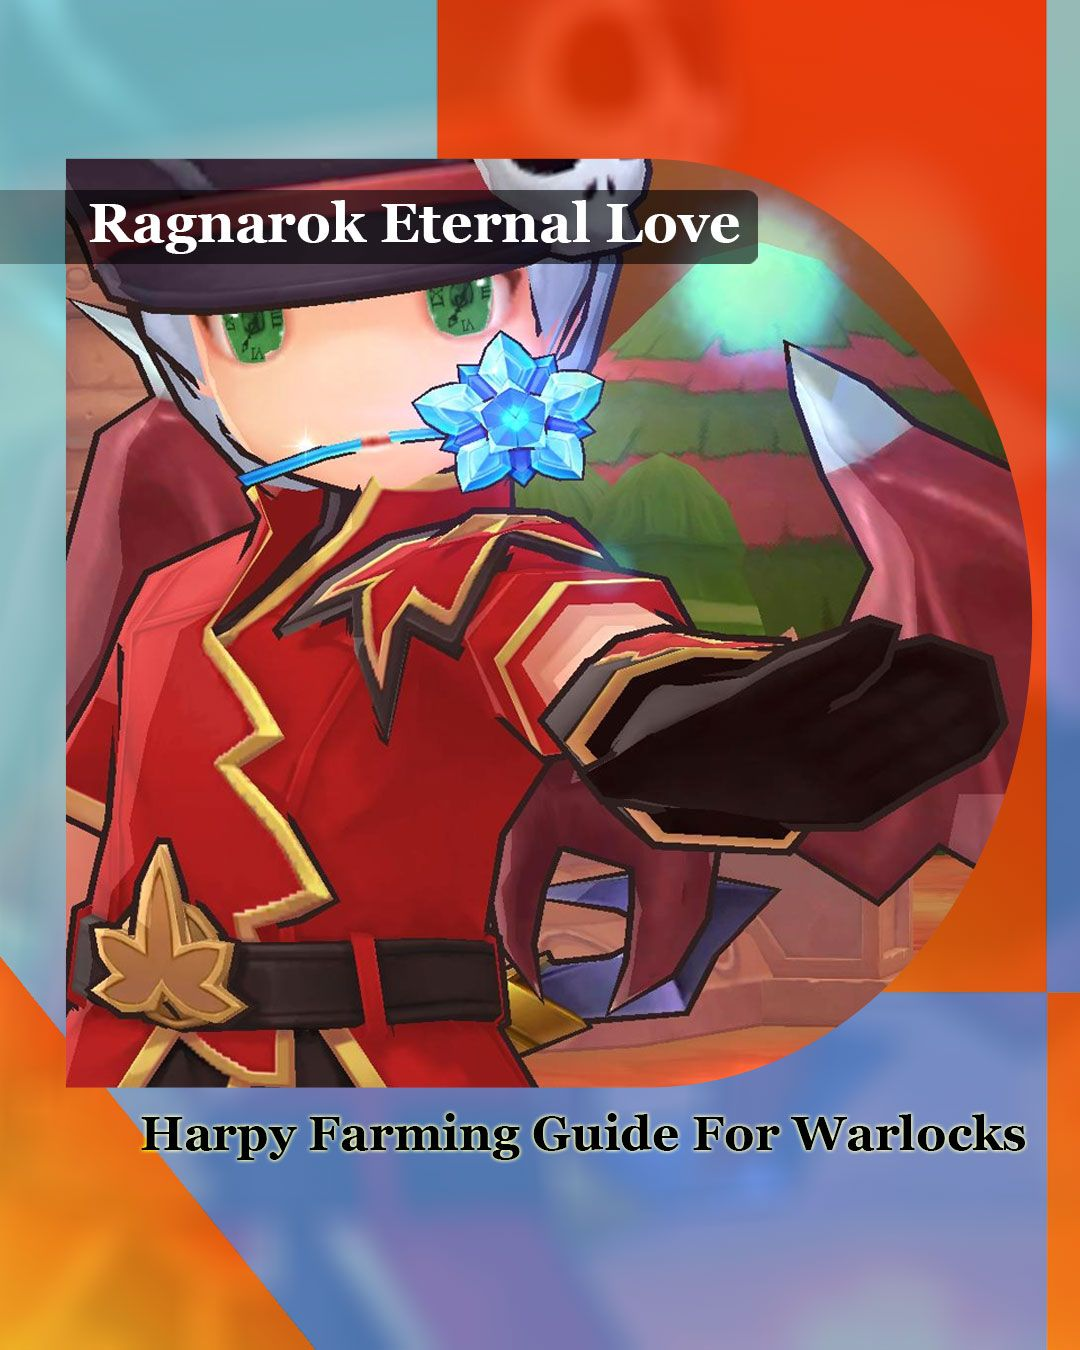 The Best Harpy Farming Guide For Warlocks Ragnaroketernallove Gaming Gamerstopia Farming Guide Cool Eyes Eternal Love